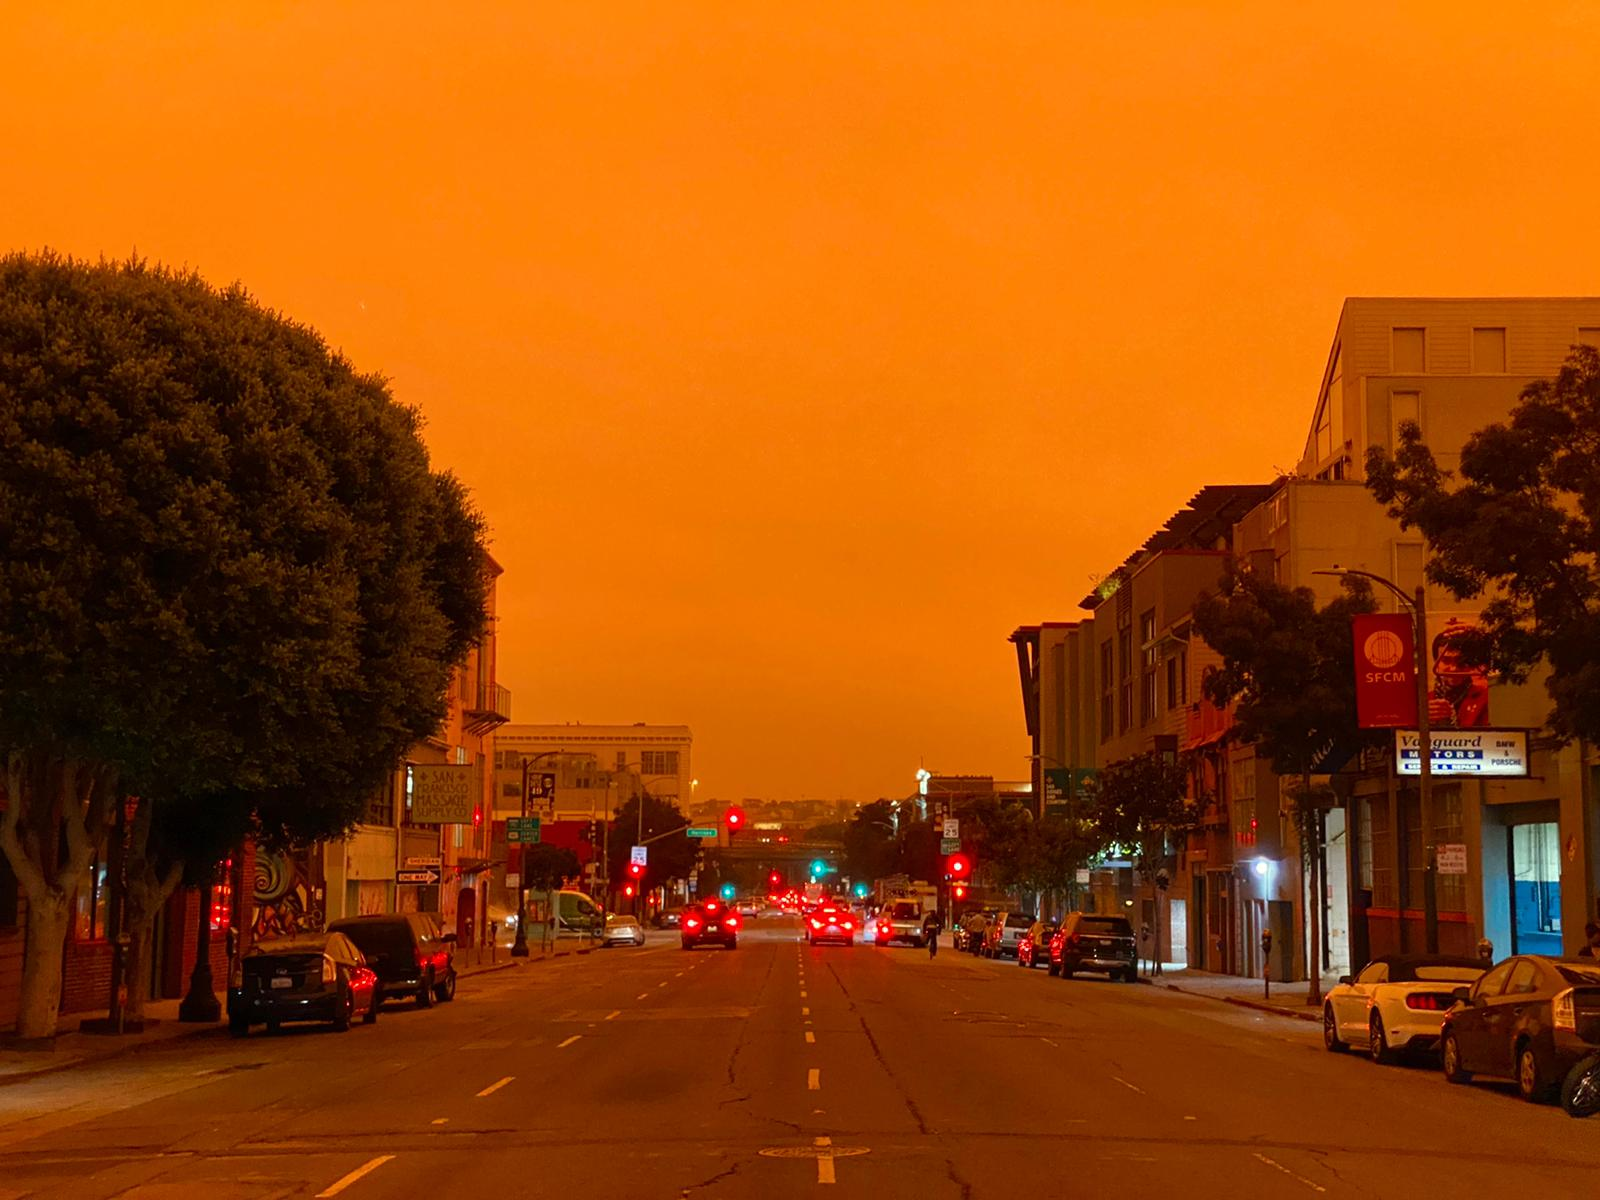 cielo-rojo-california-incendios-san-francisco